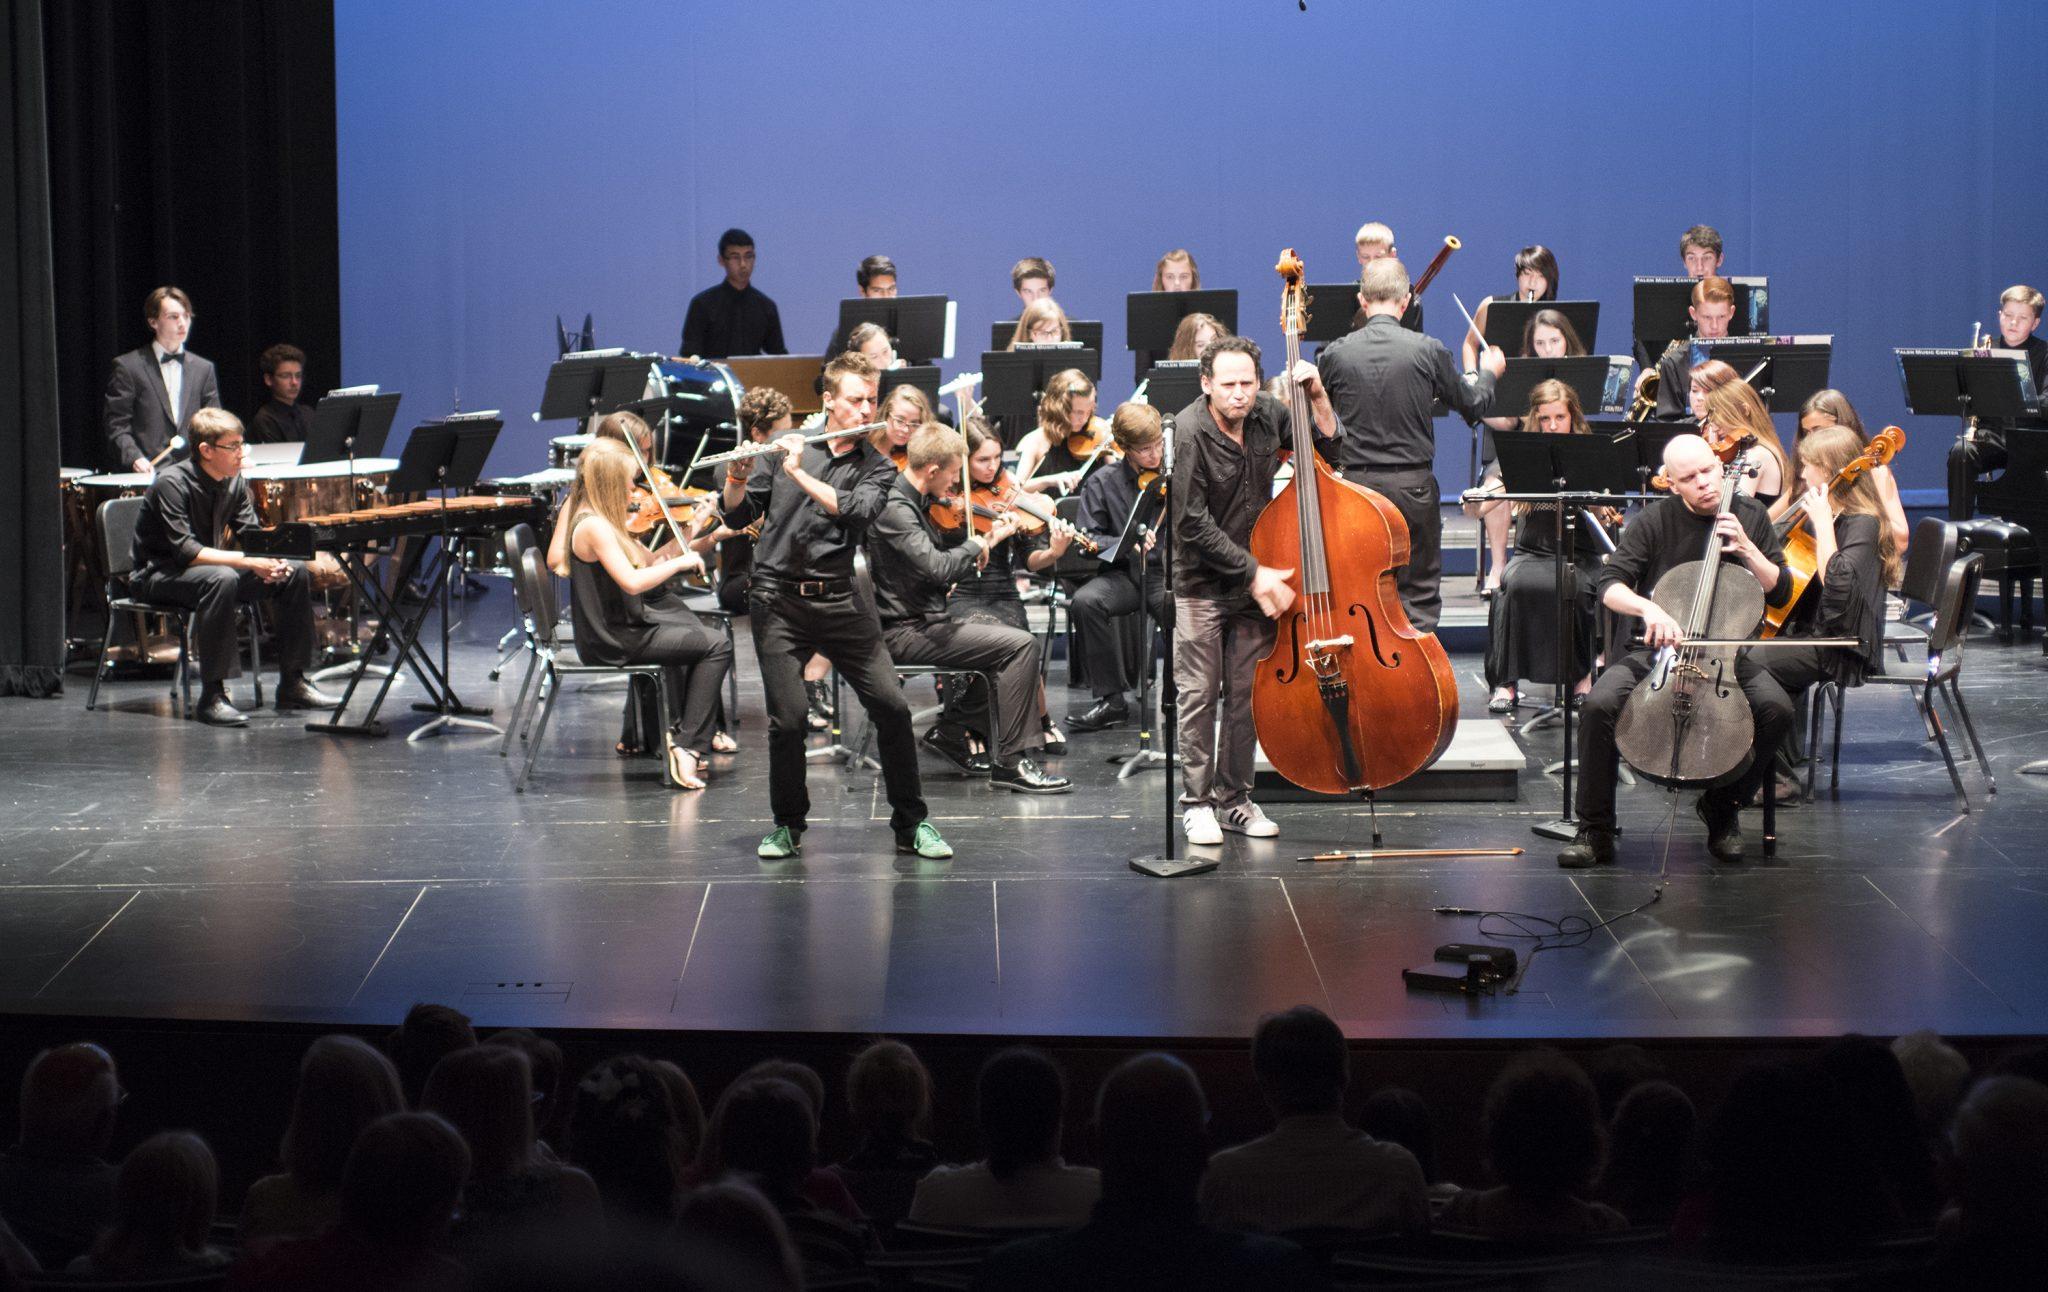 TJ's Music Academy